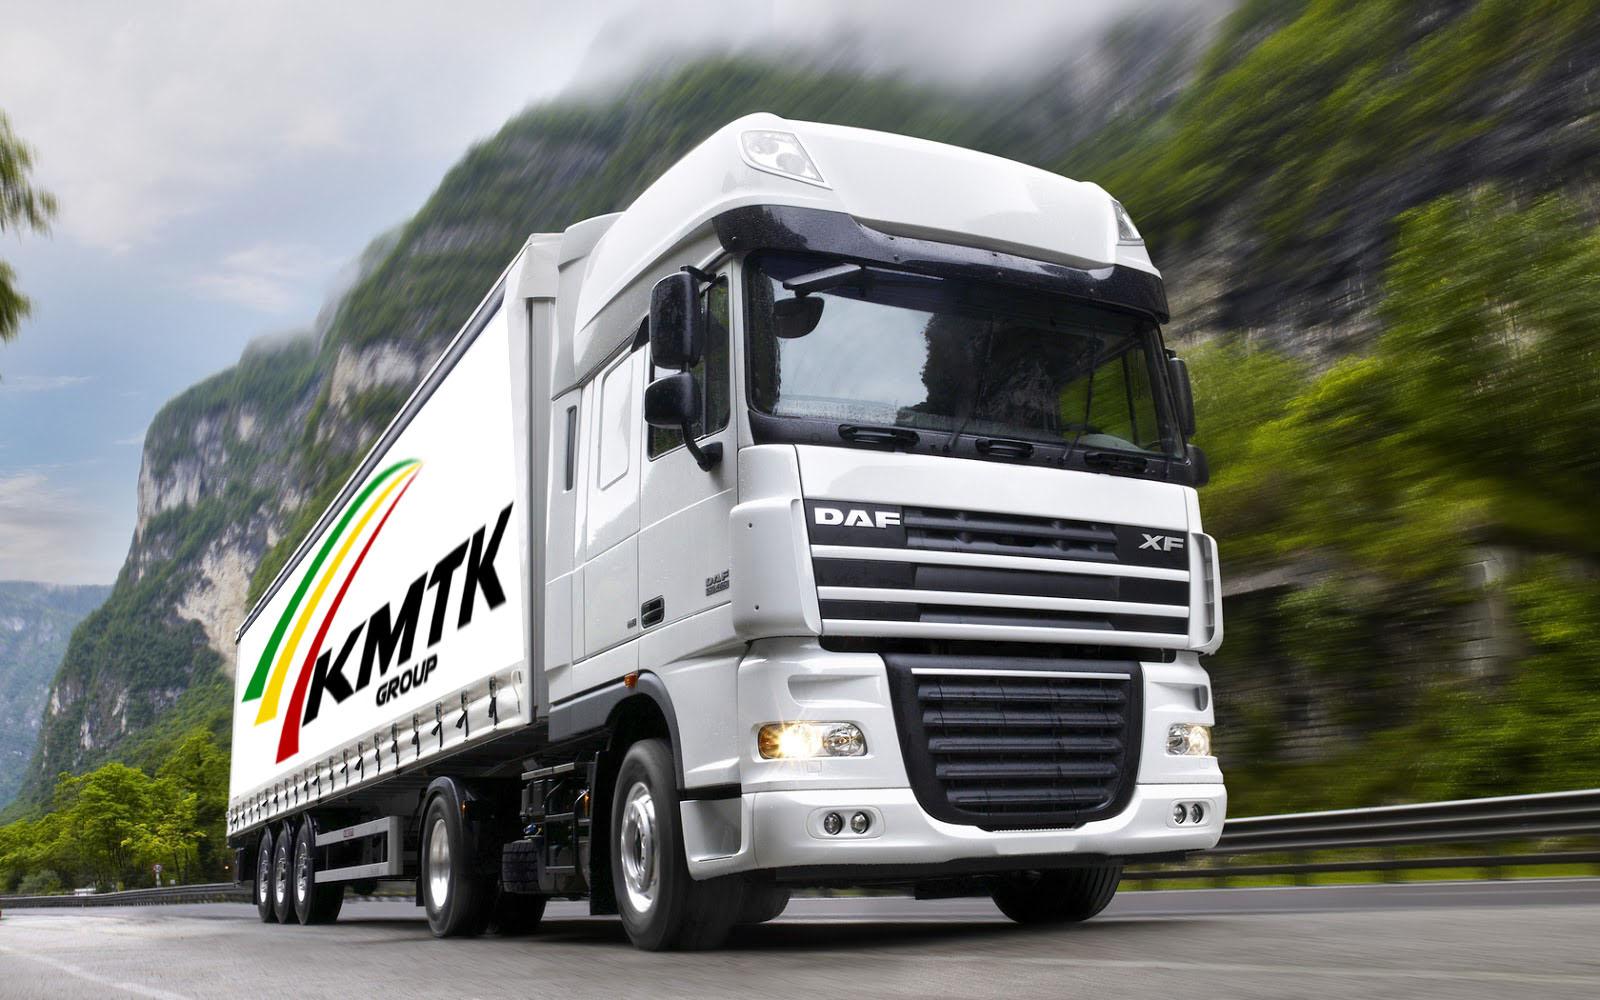 KMTK truck